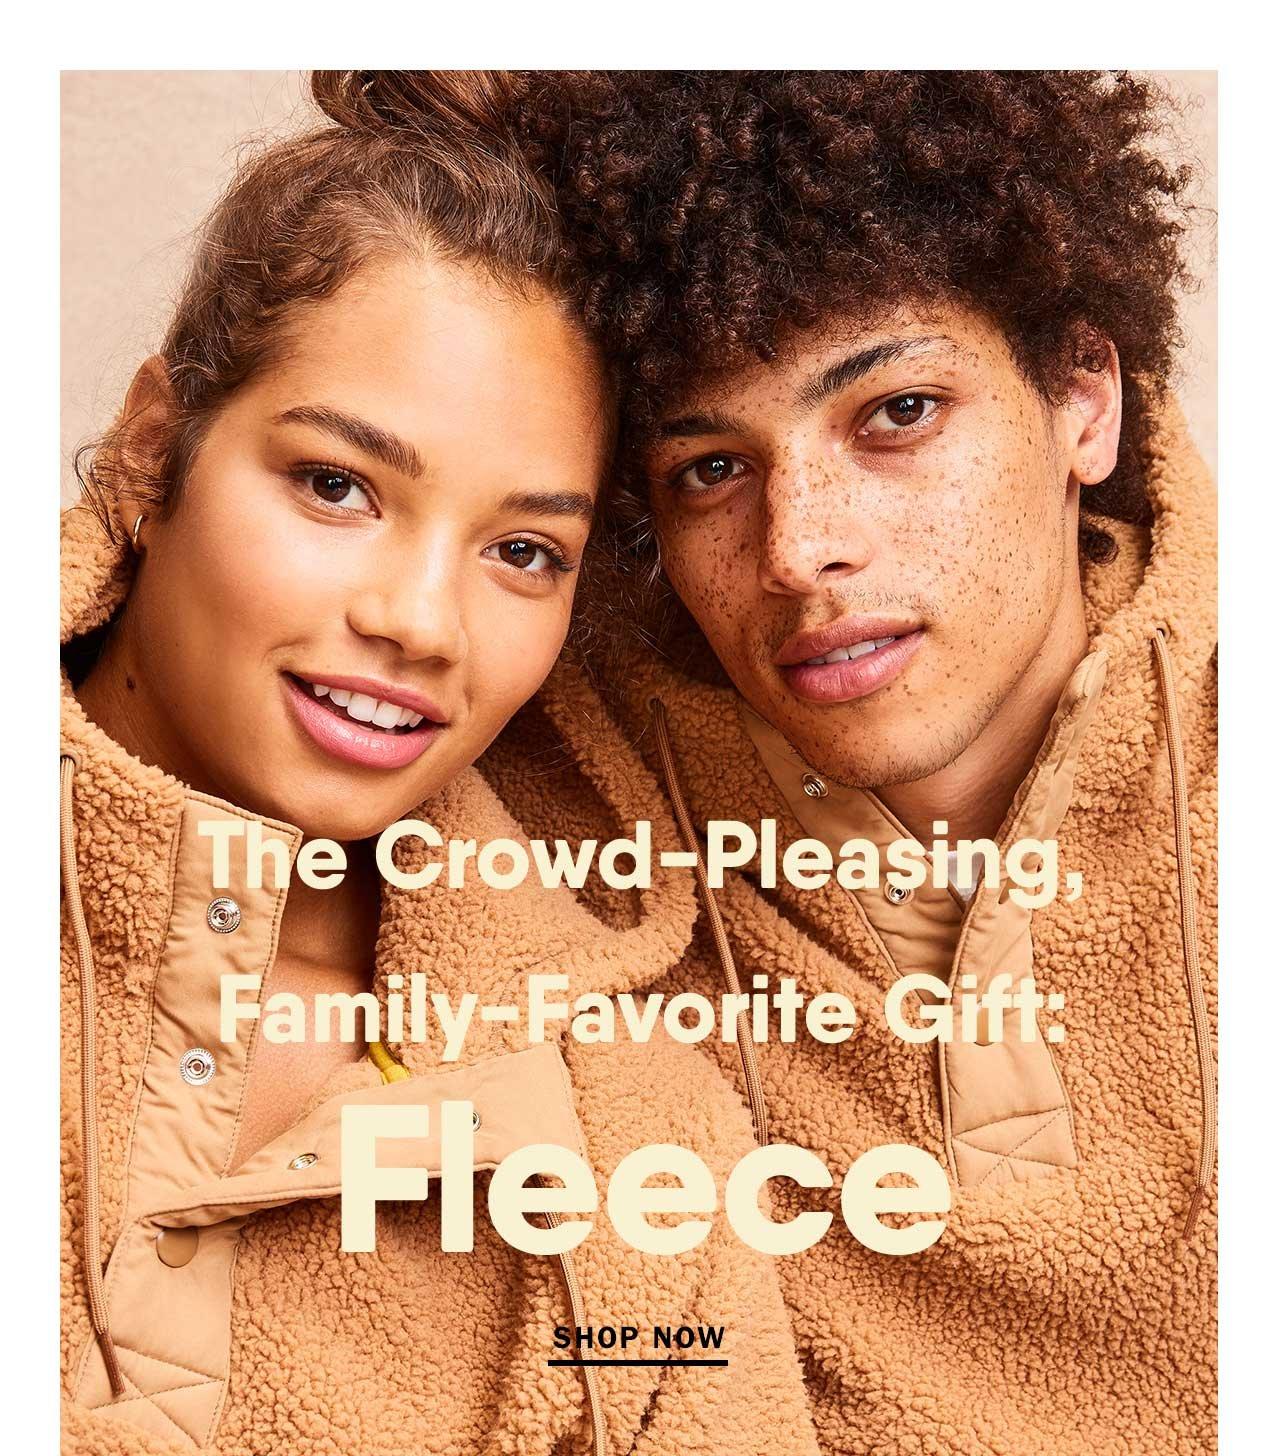 The crowd-pleasing, family-favorite gift: Fleece